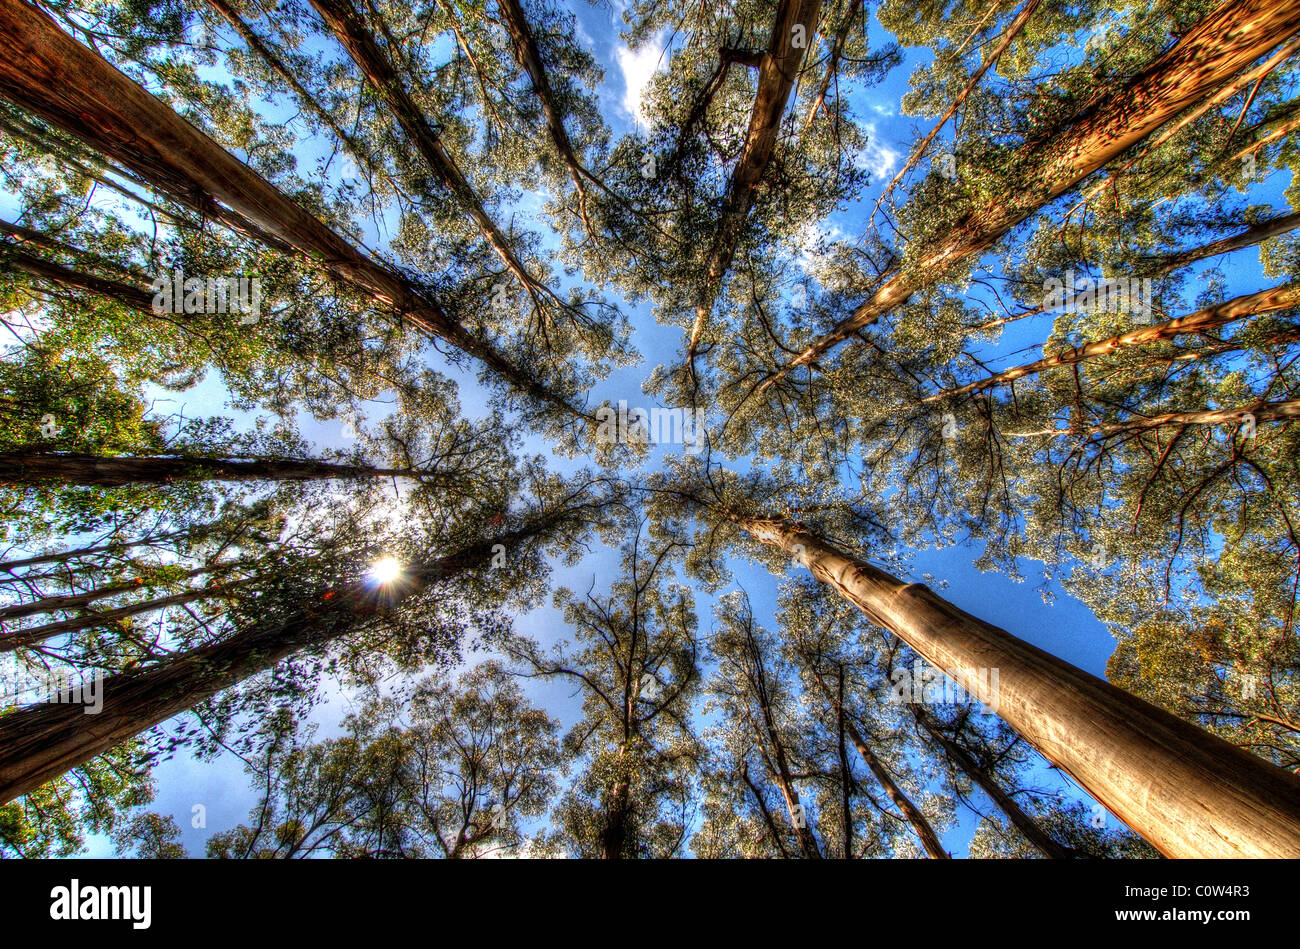 The eucalyptus trees of Sherbrooke Forest, Dandenongs, Victoria Australia Stock Photo